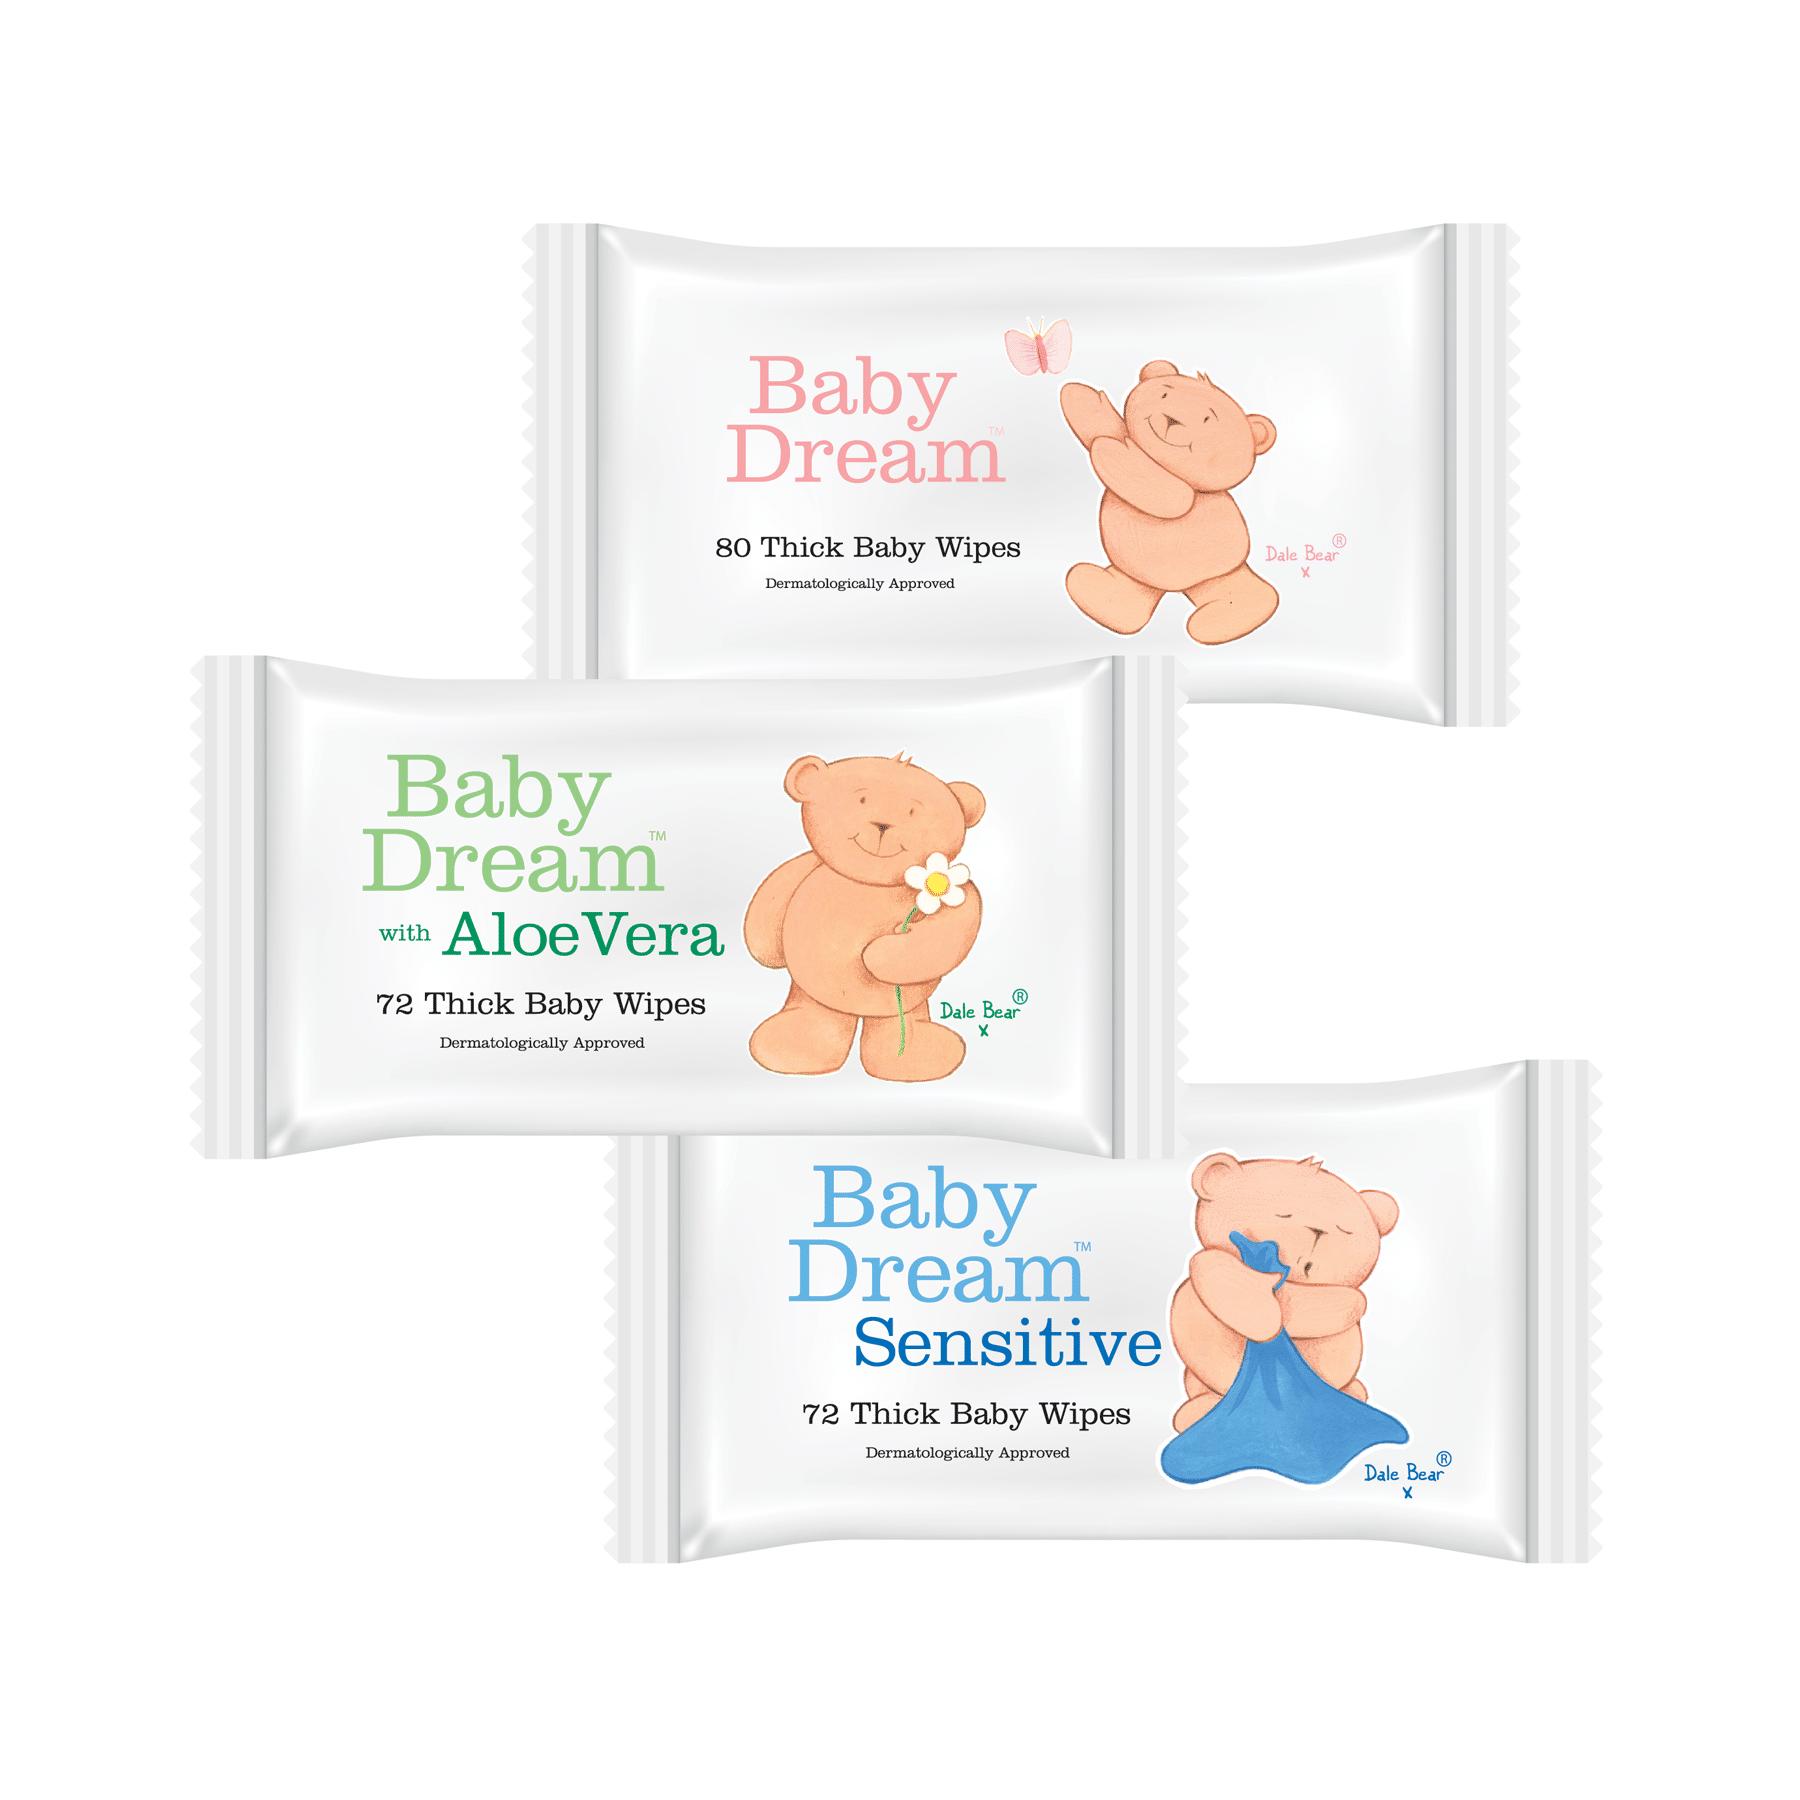 Baby Dream Wipes Packaging